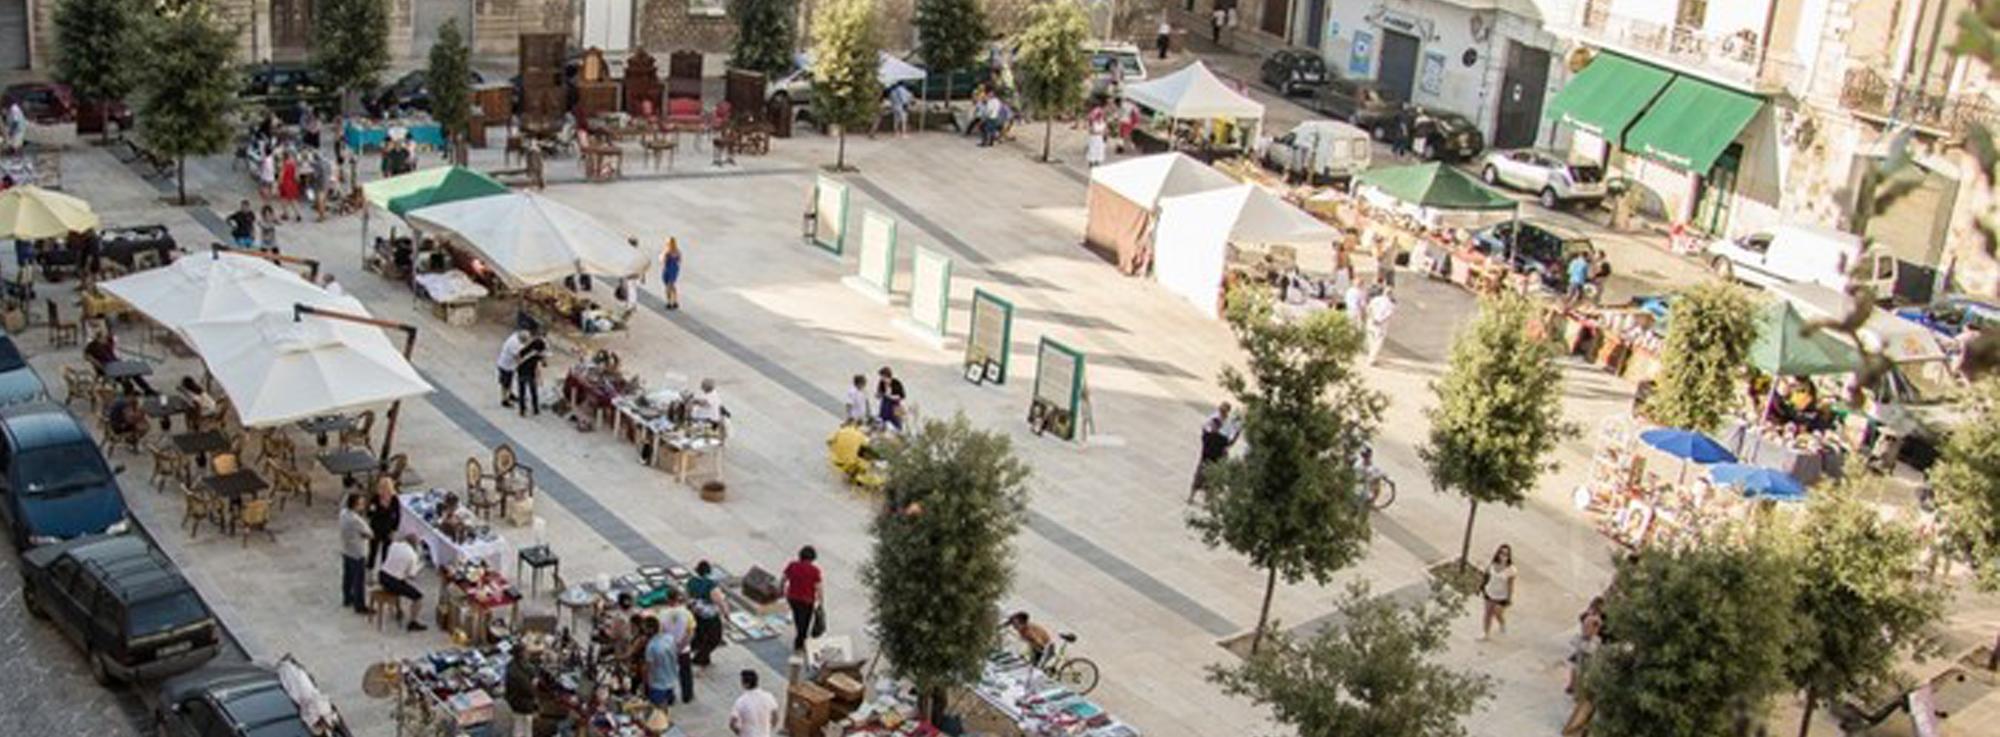 Trani: Sùvenir, ricordi di piazza